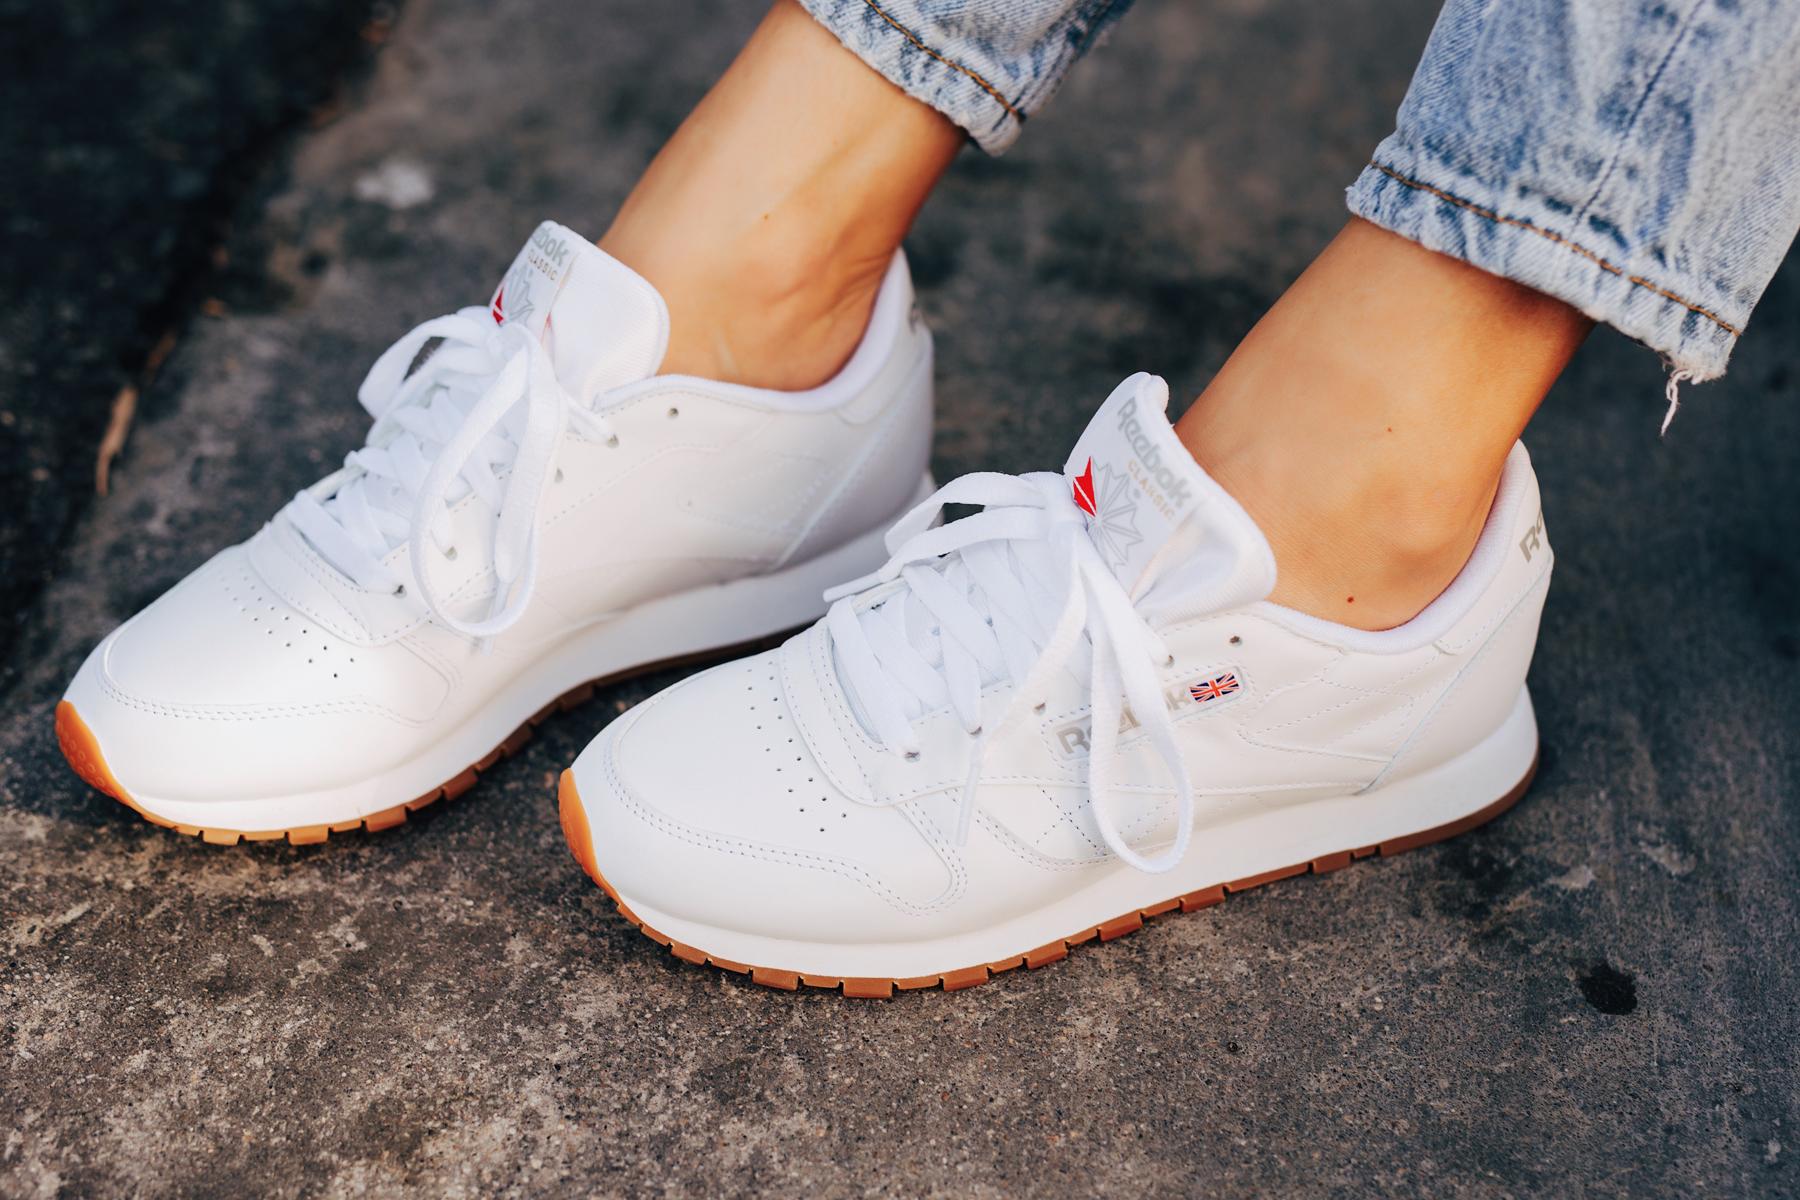 Fashion Jackson Wearing Reebok Classic Leather White Sneakers